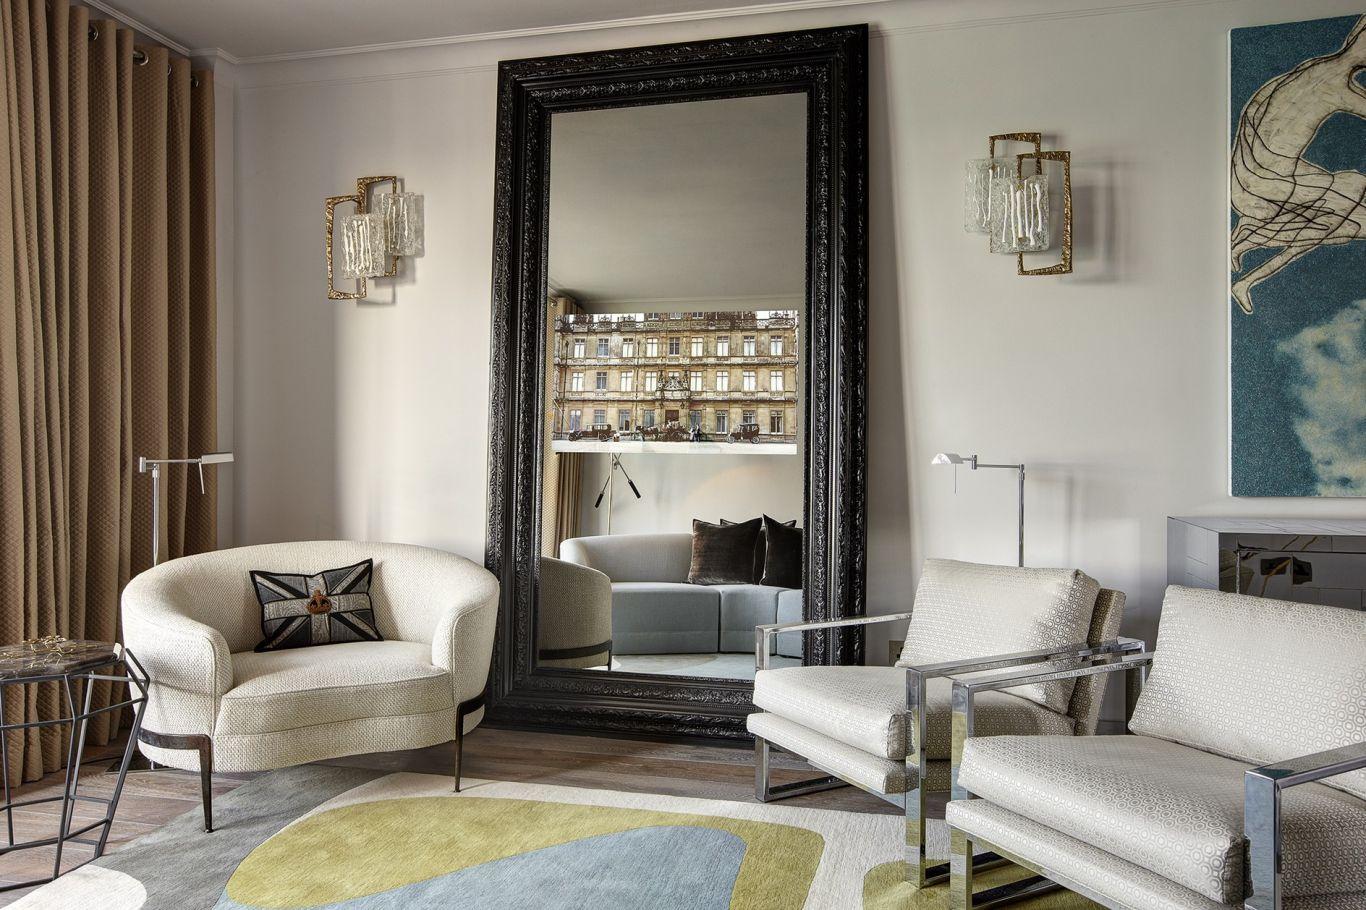 Bijou interior design in Notting Hill